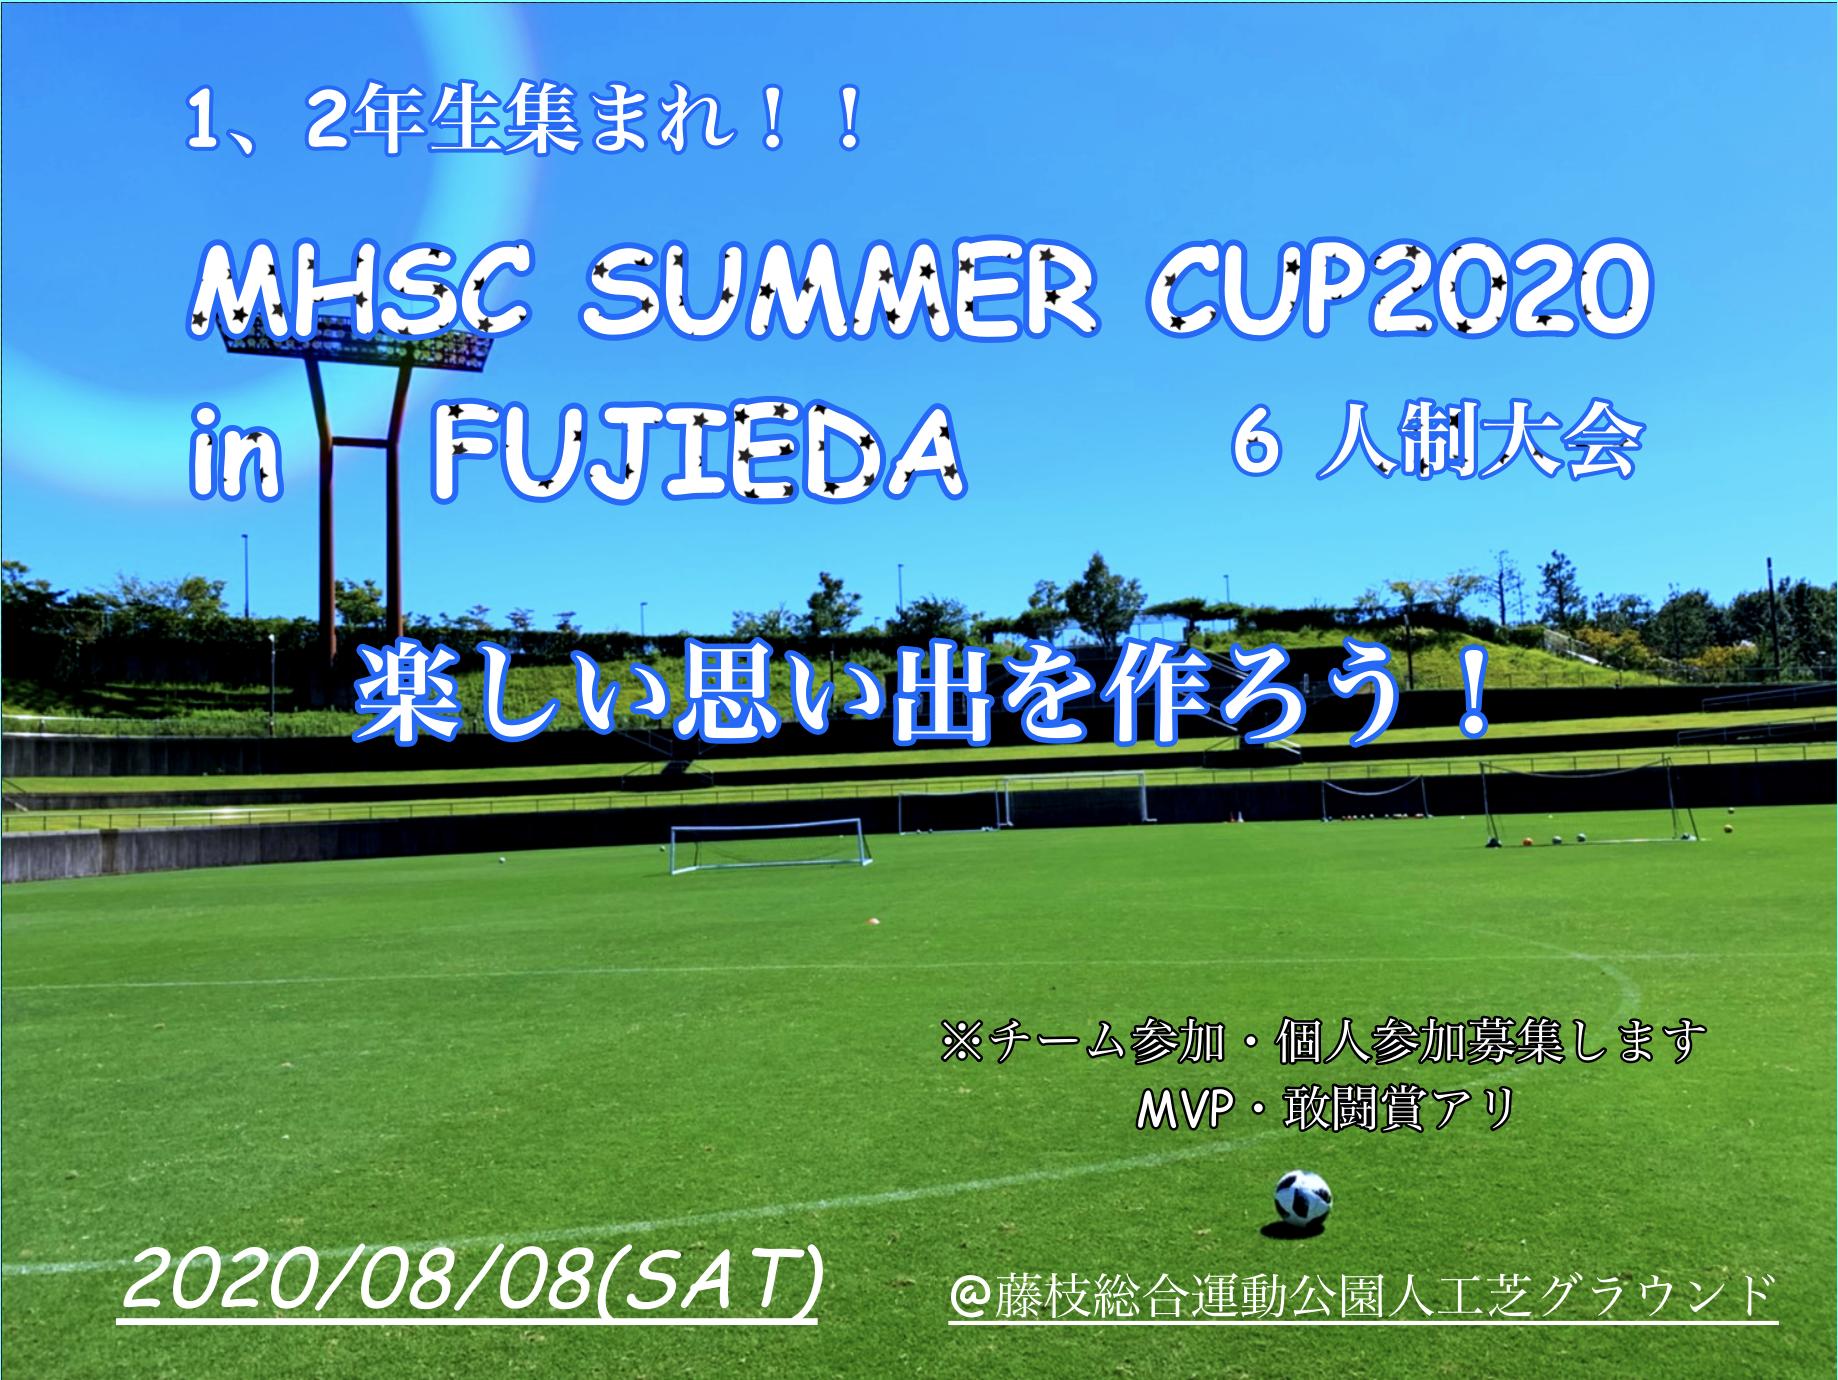 MHSC SUMMER CUP